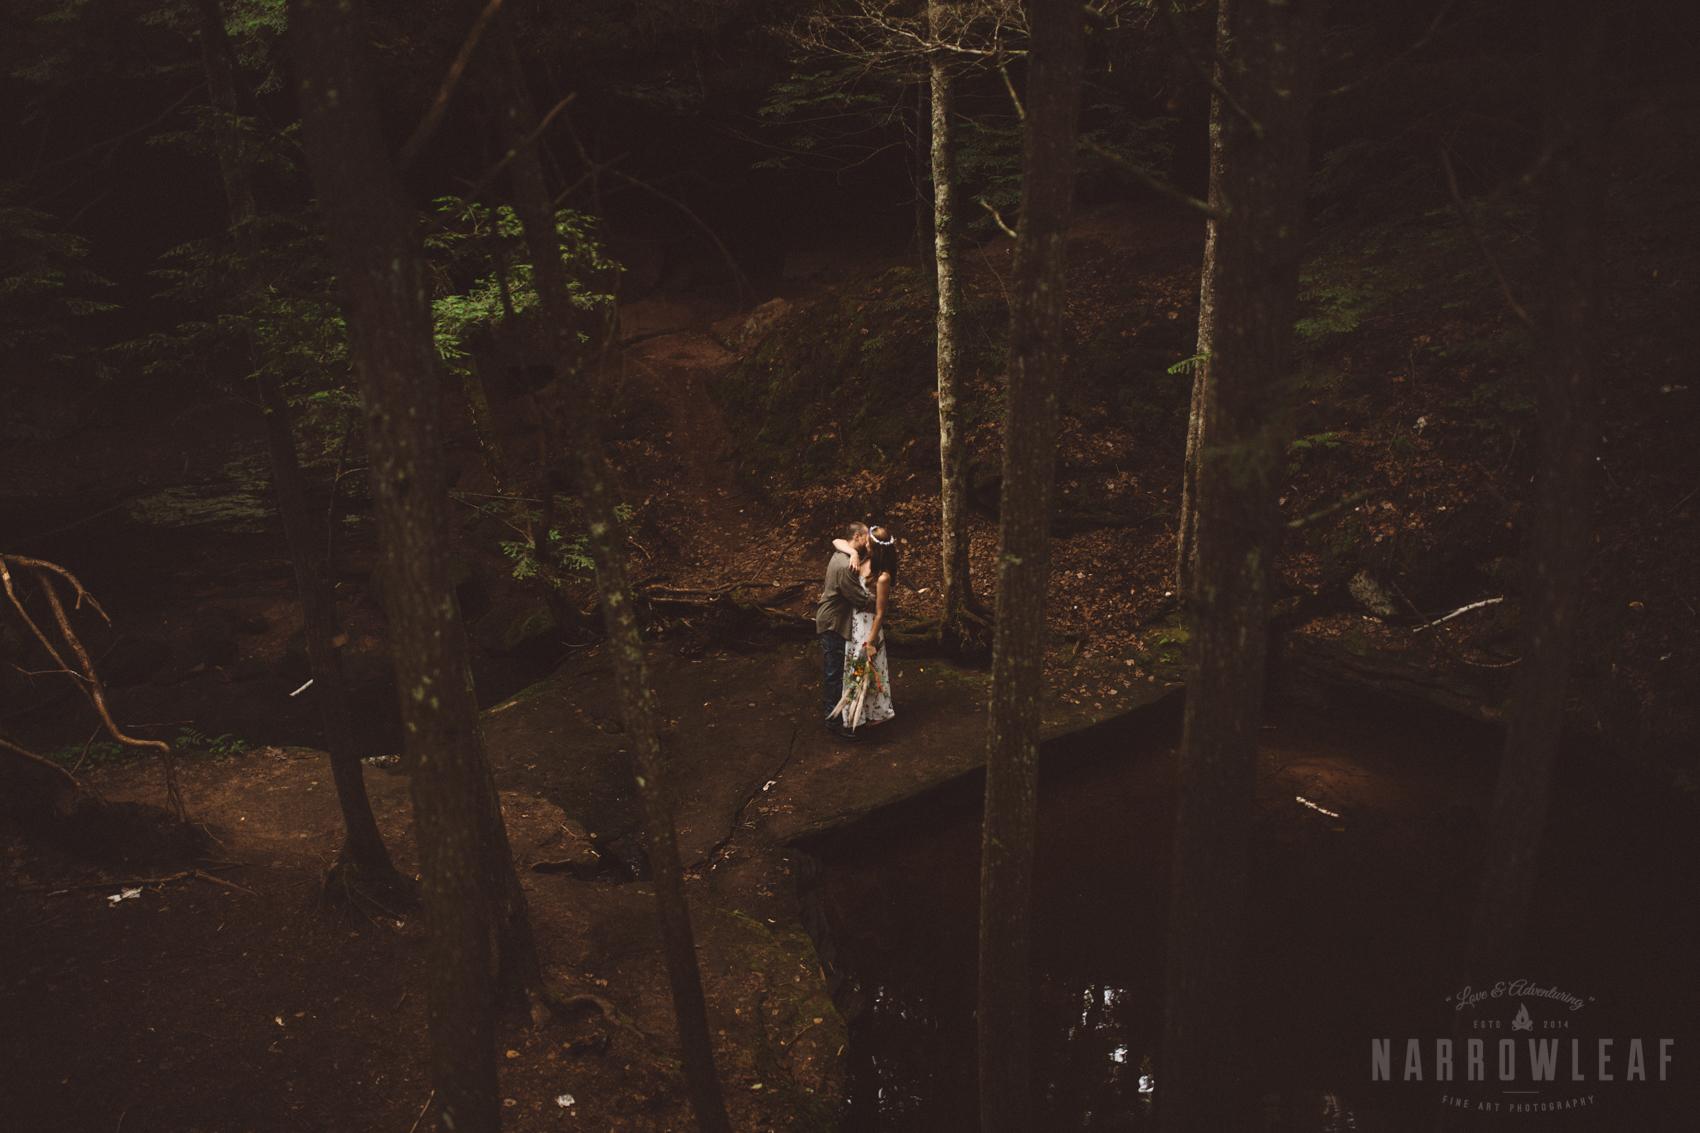 NarrowLeaf_Love_&_Adventure_Photography-5139.jpg